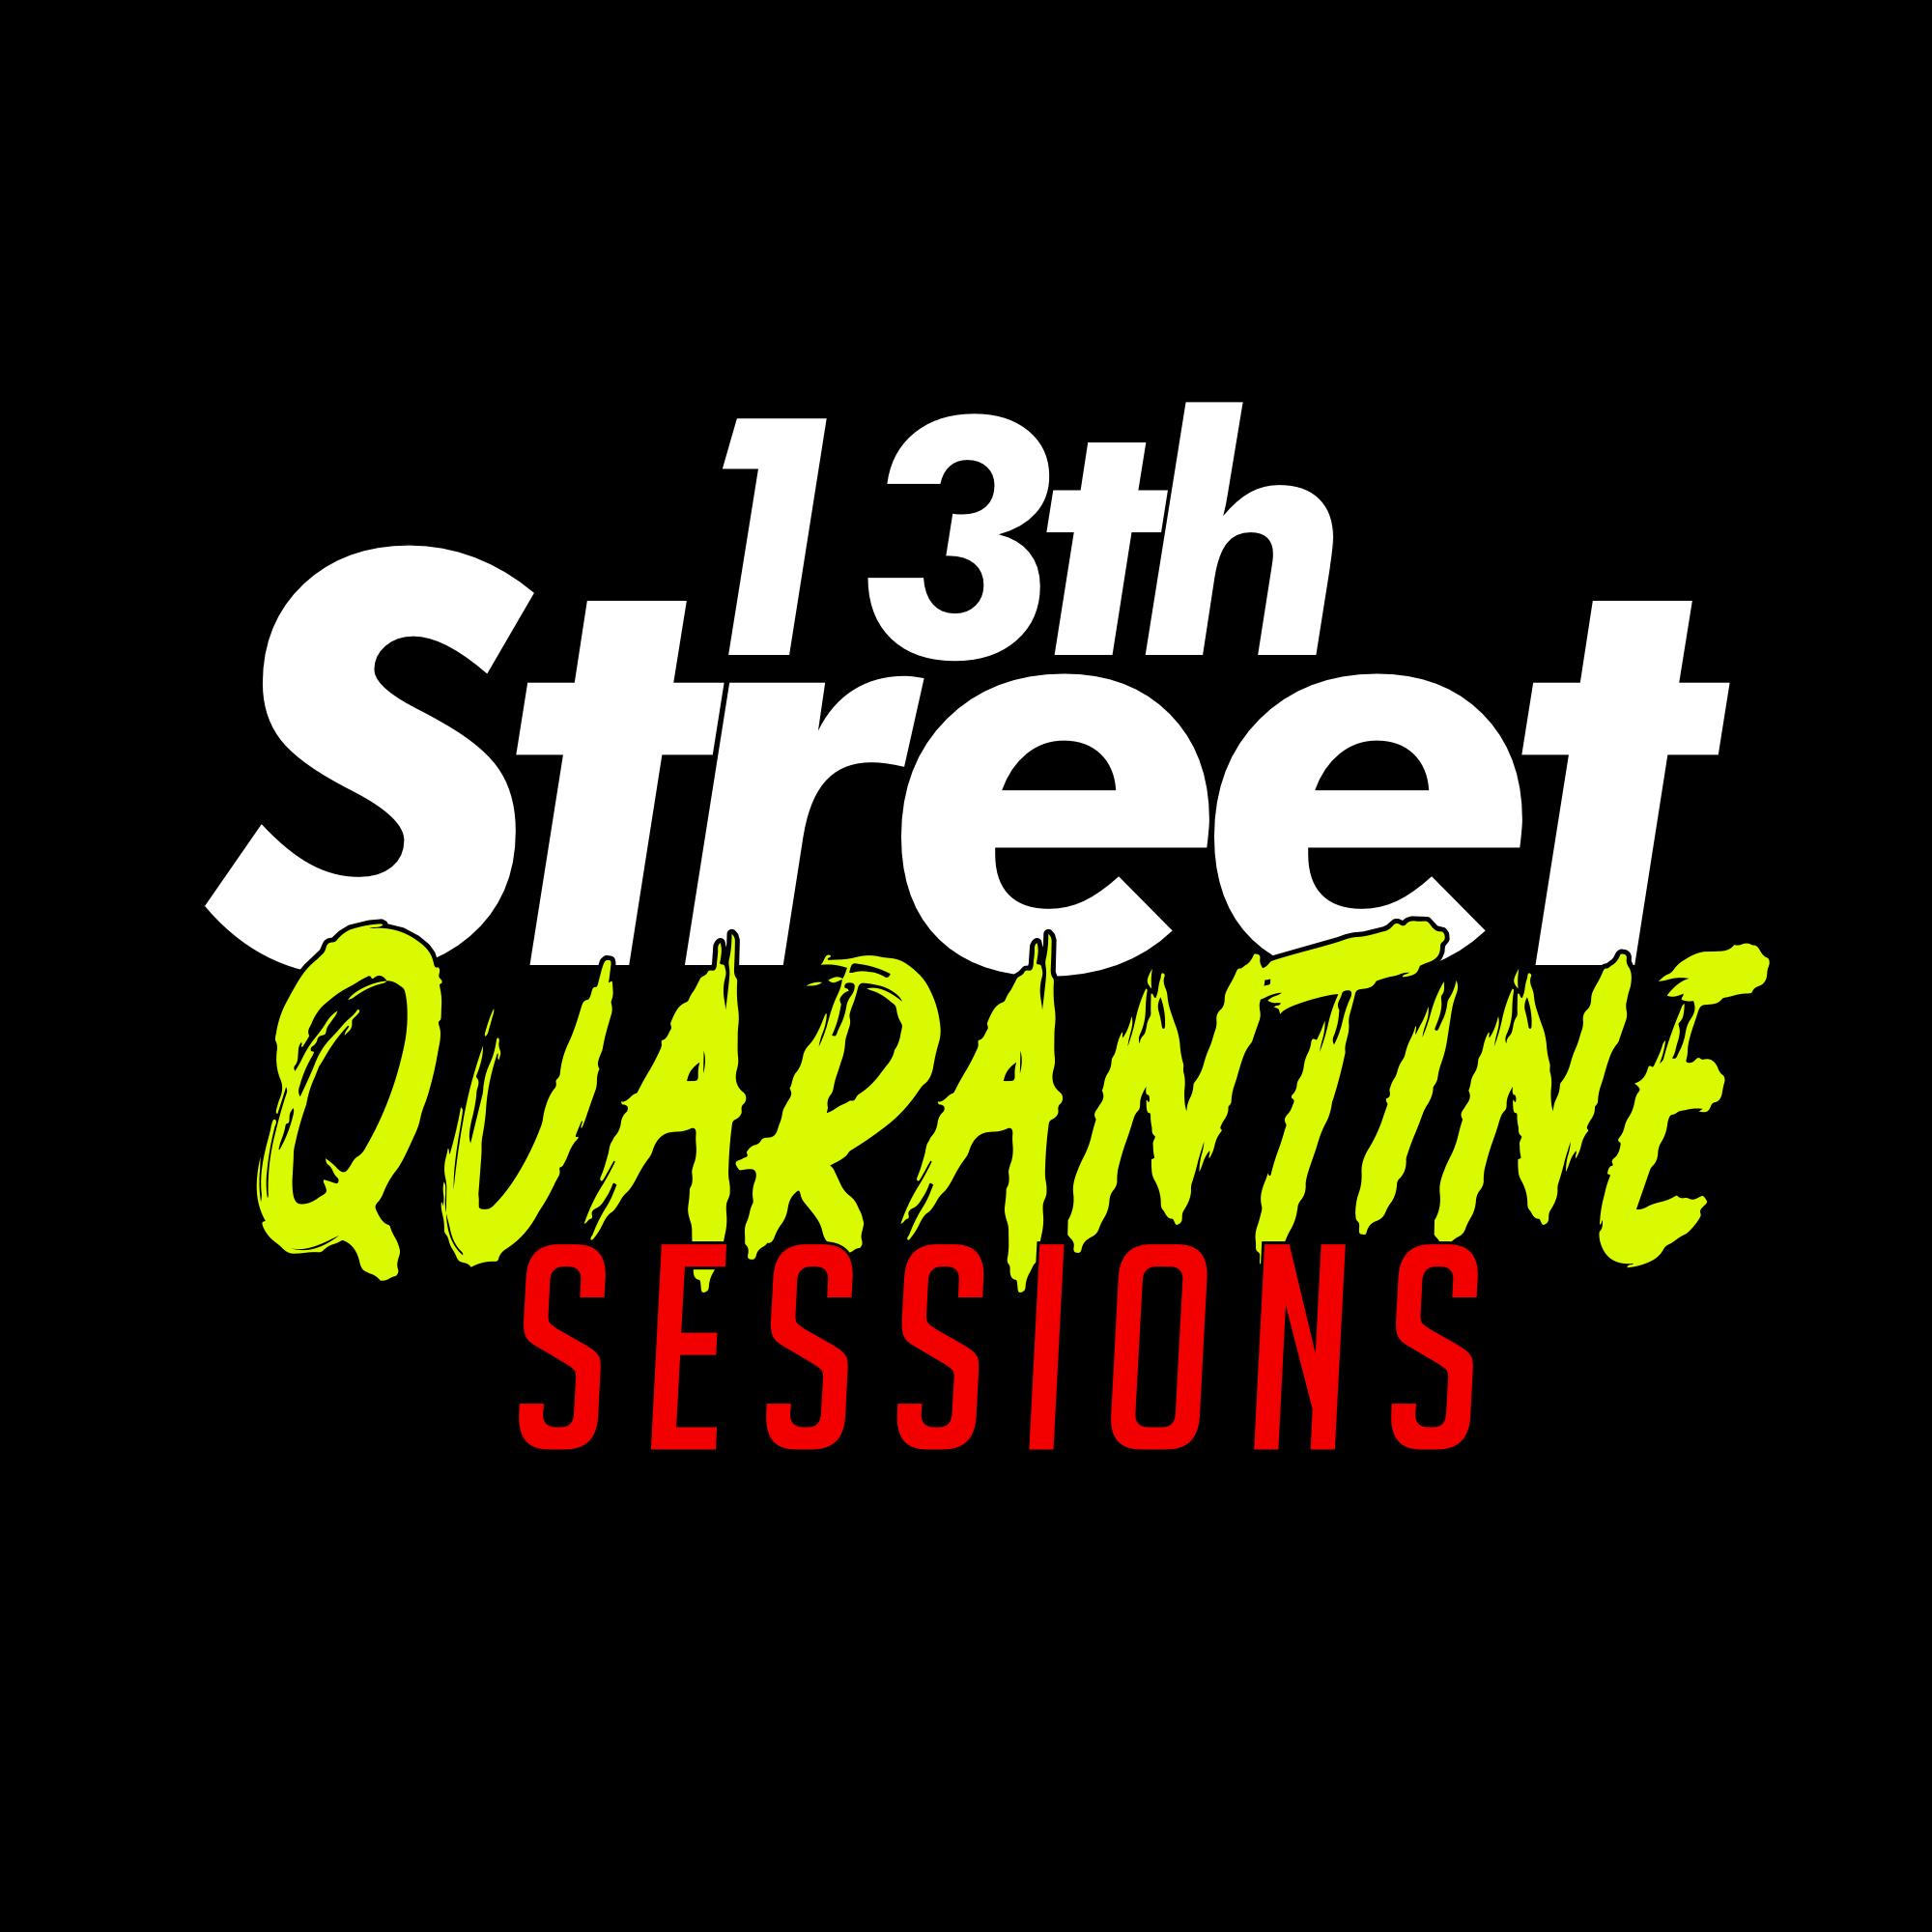 Jamaica 13th Street Quarantine Sessions Reggae Dancehall Music Blog 13thStreetPromo 13thStreetPromotions Listening Session Youtube Caribbean Boston Rhiya Luna Fvrfvn Trinidad Trinidad and Tobago Hip Hop Singer